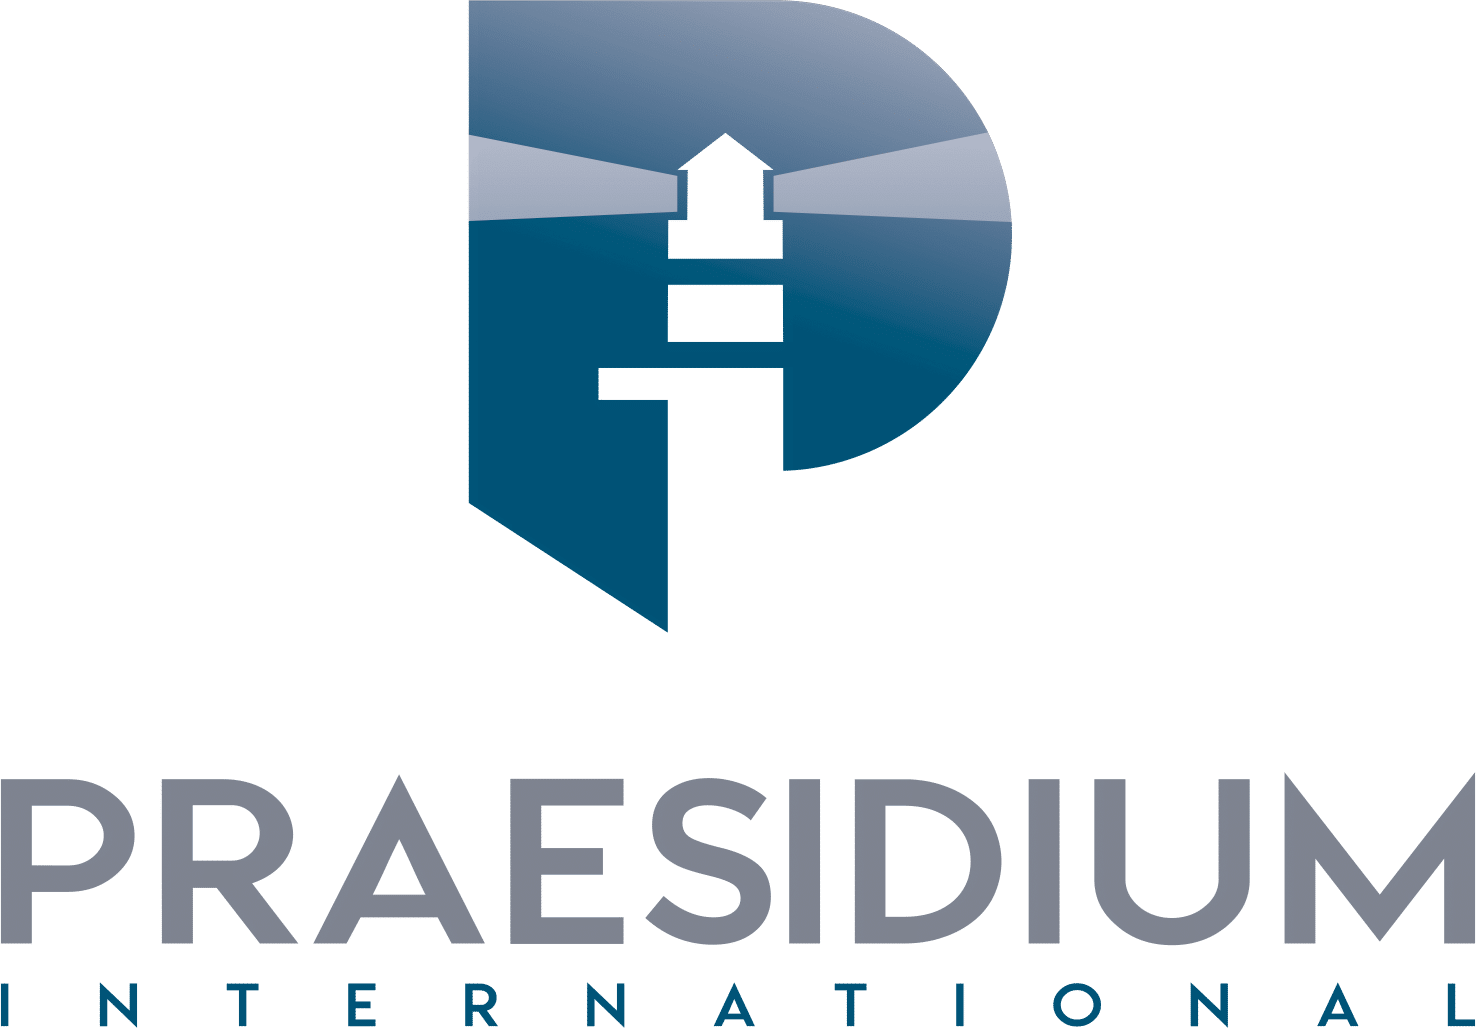 Praesidium Intrnational Logo cybersecurity